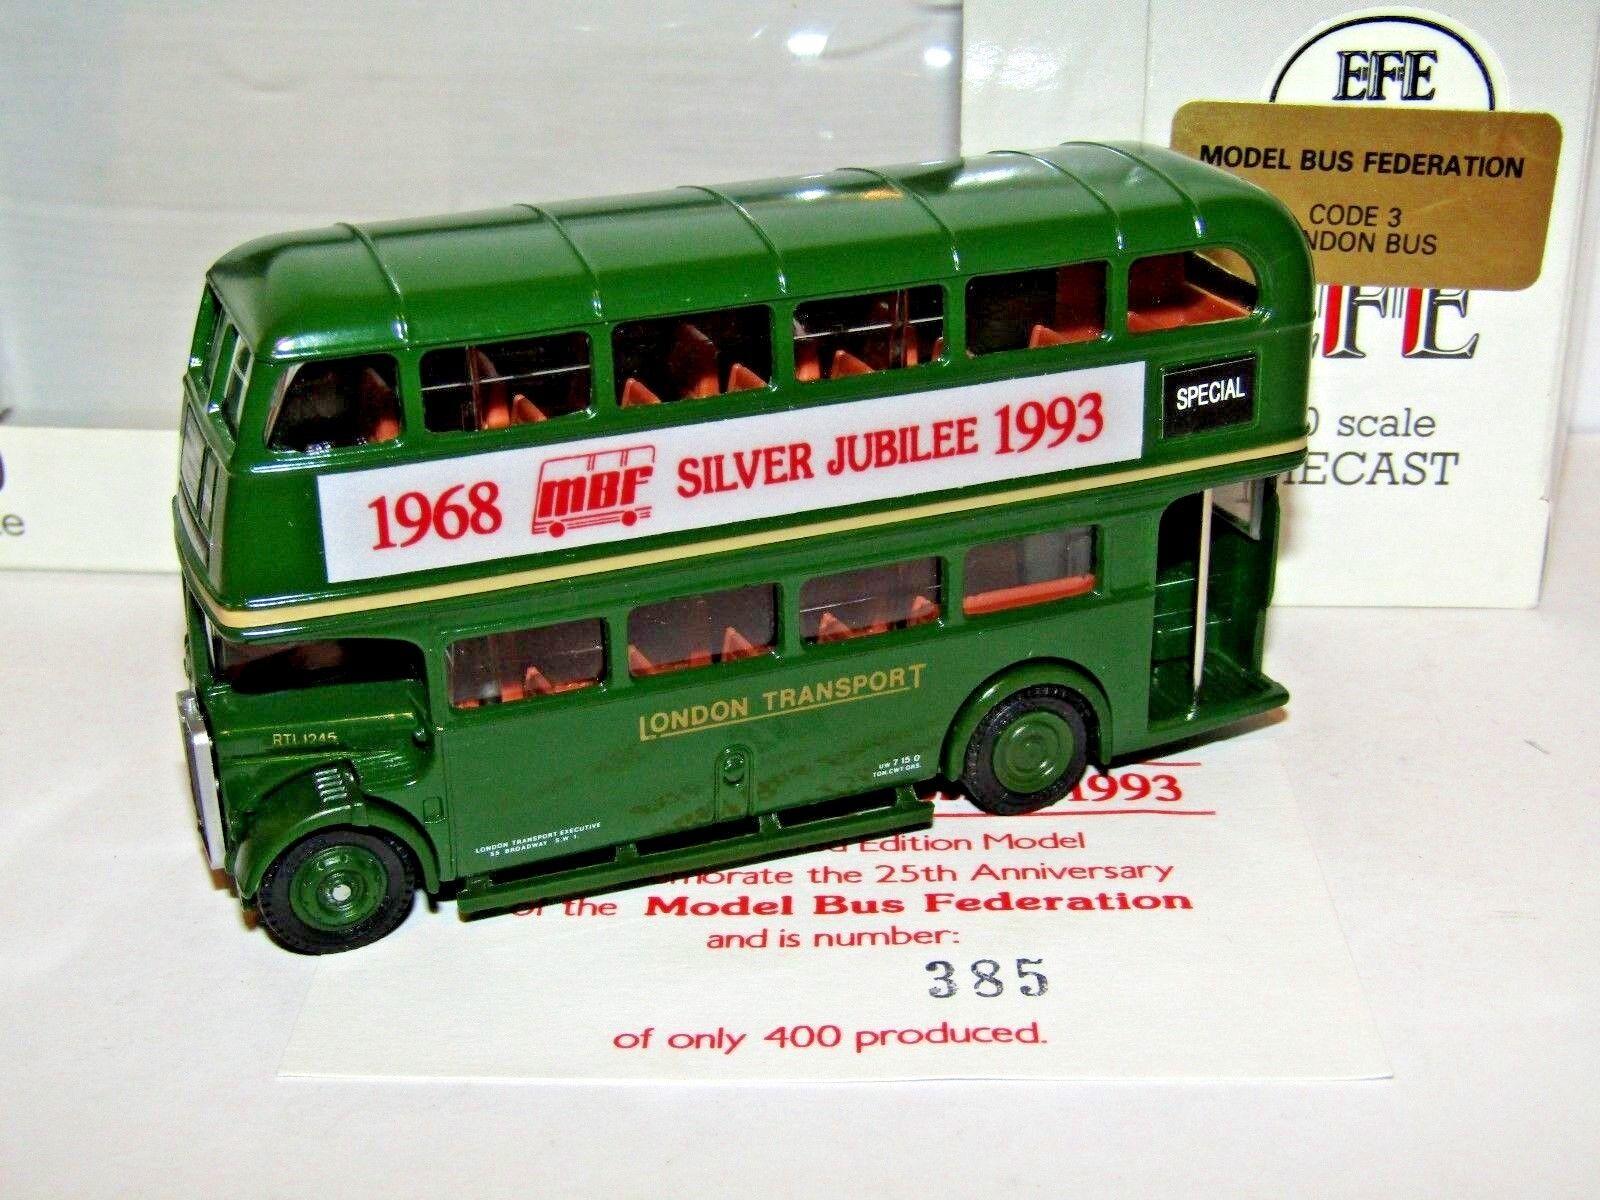 Efe RTL Bus Londres transporte MBF Jubileo 1993 verde 1 76 11103B